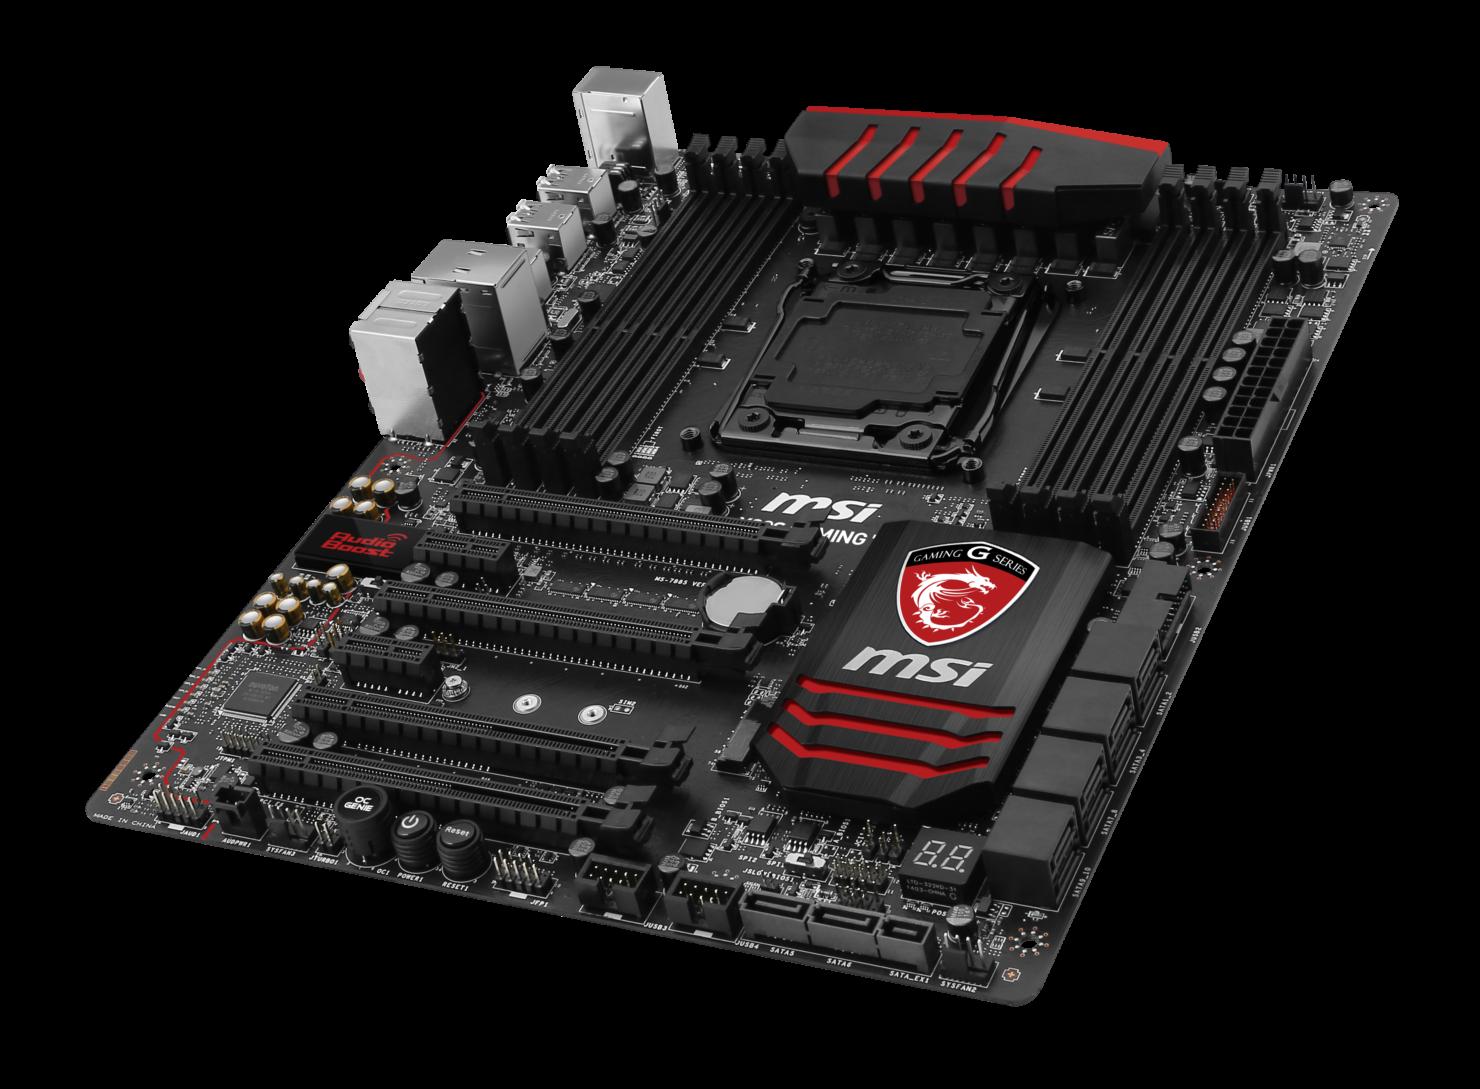 msi-x99s-gaming-7-motherboard_2